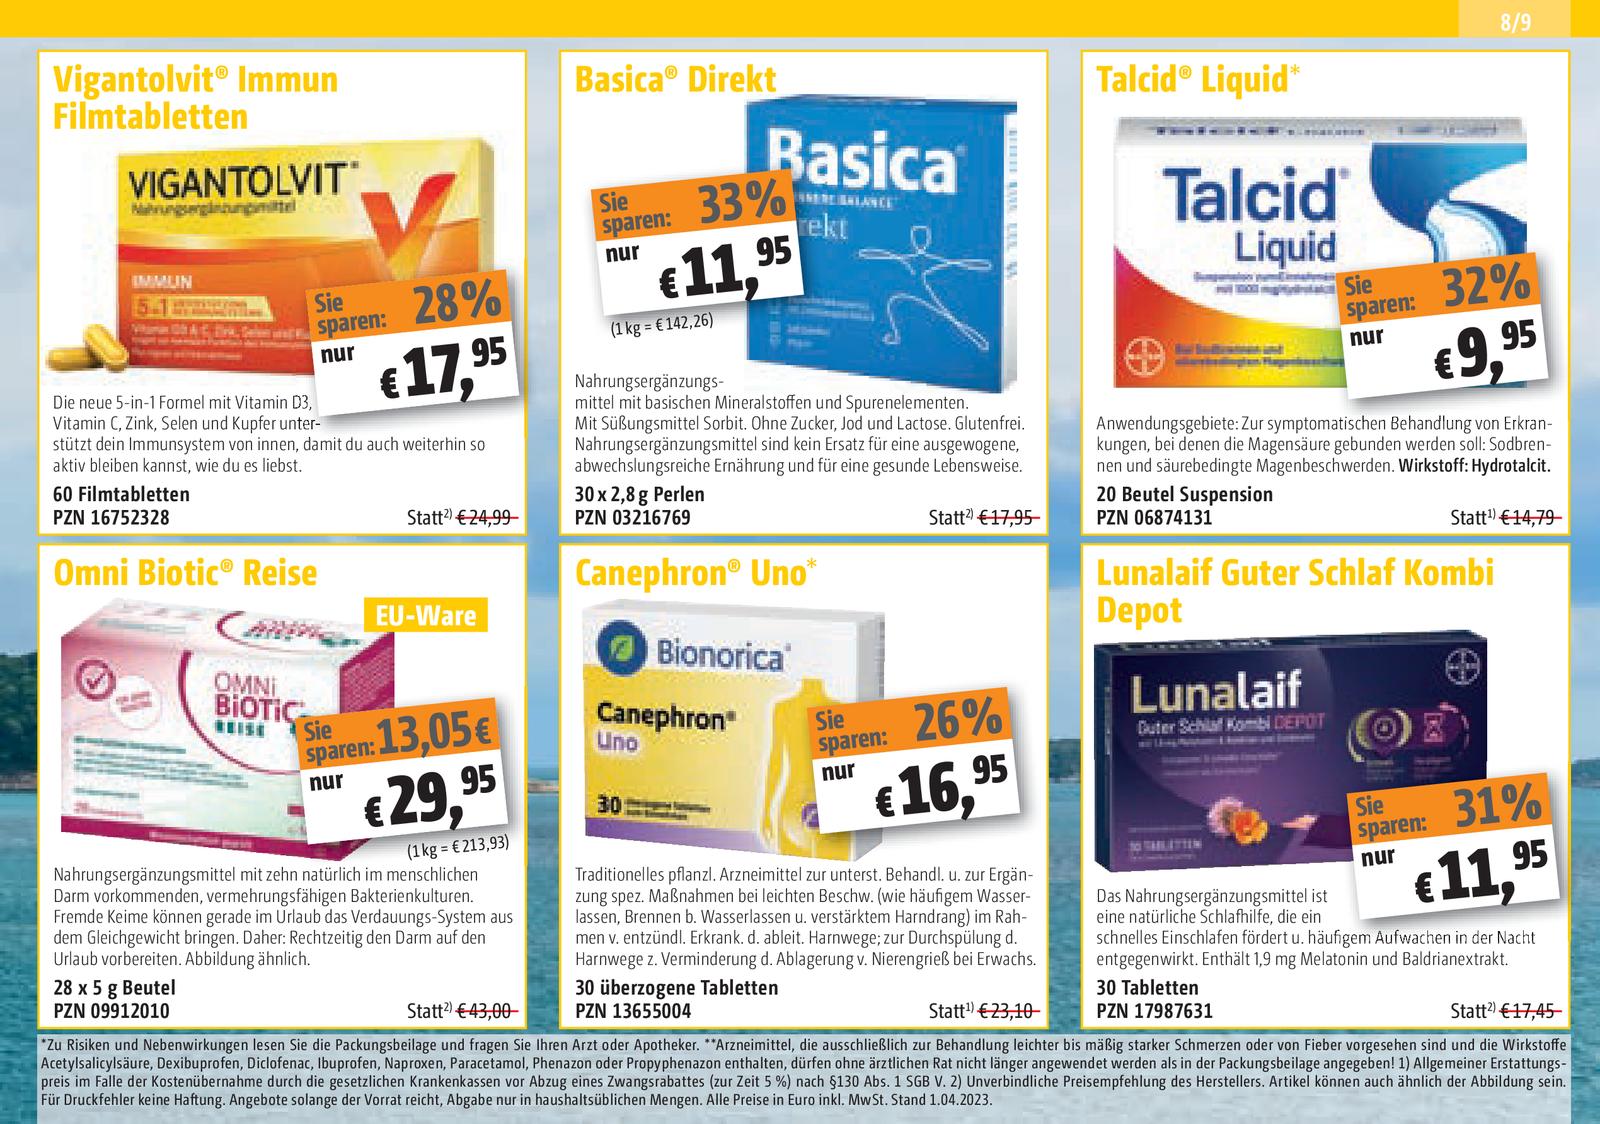 https://mein-uploads.apocdn.net/5424/leaflets/5424_flyer-Seite9.png